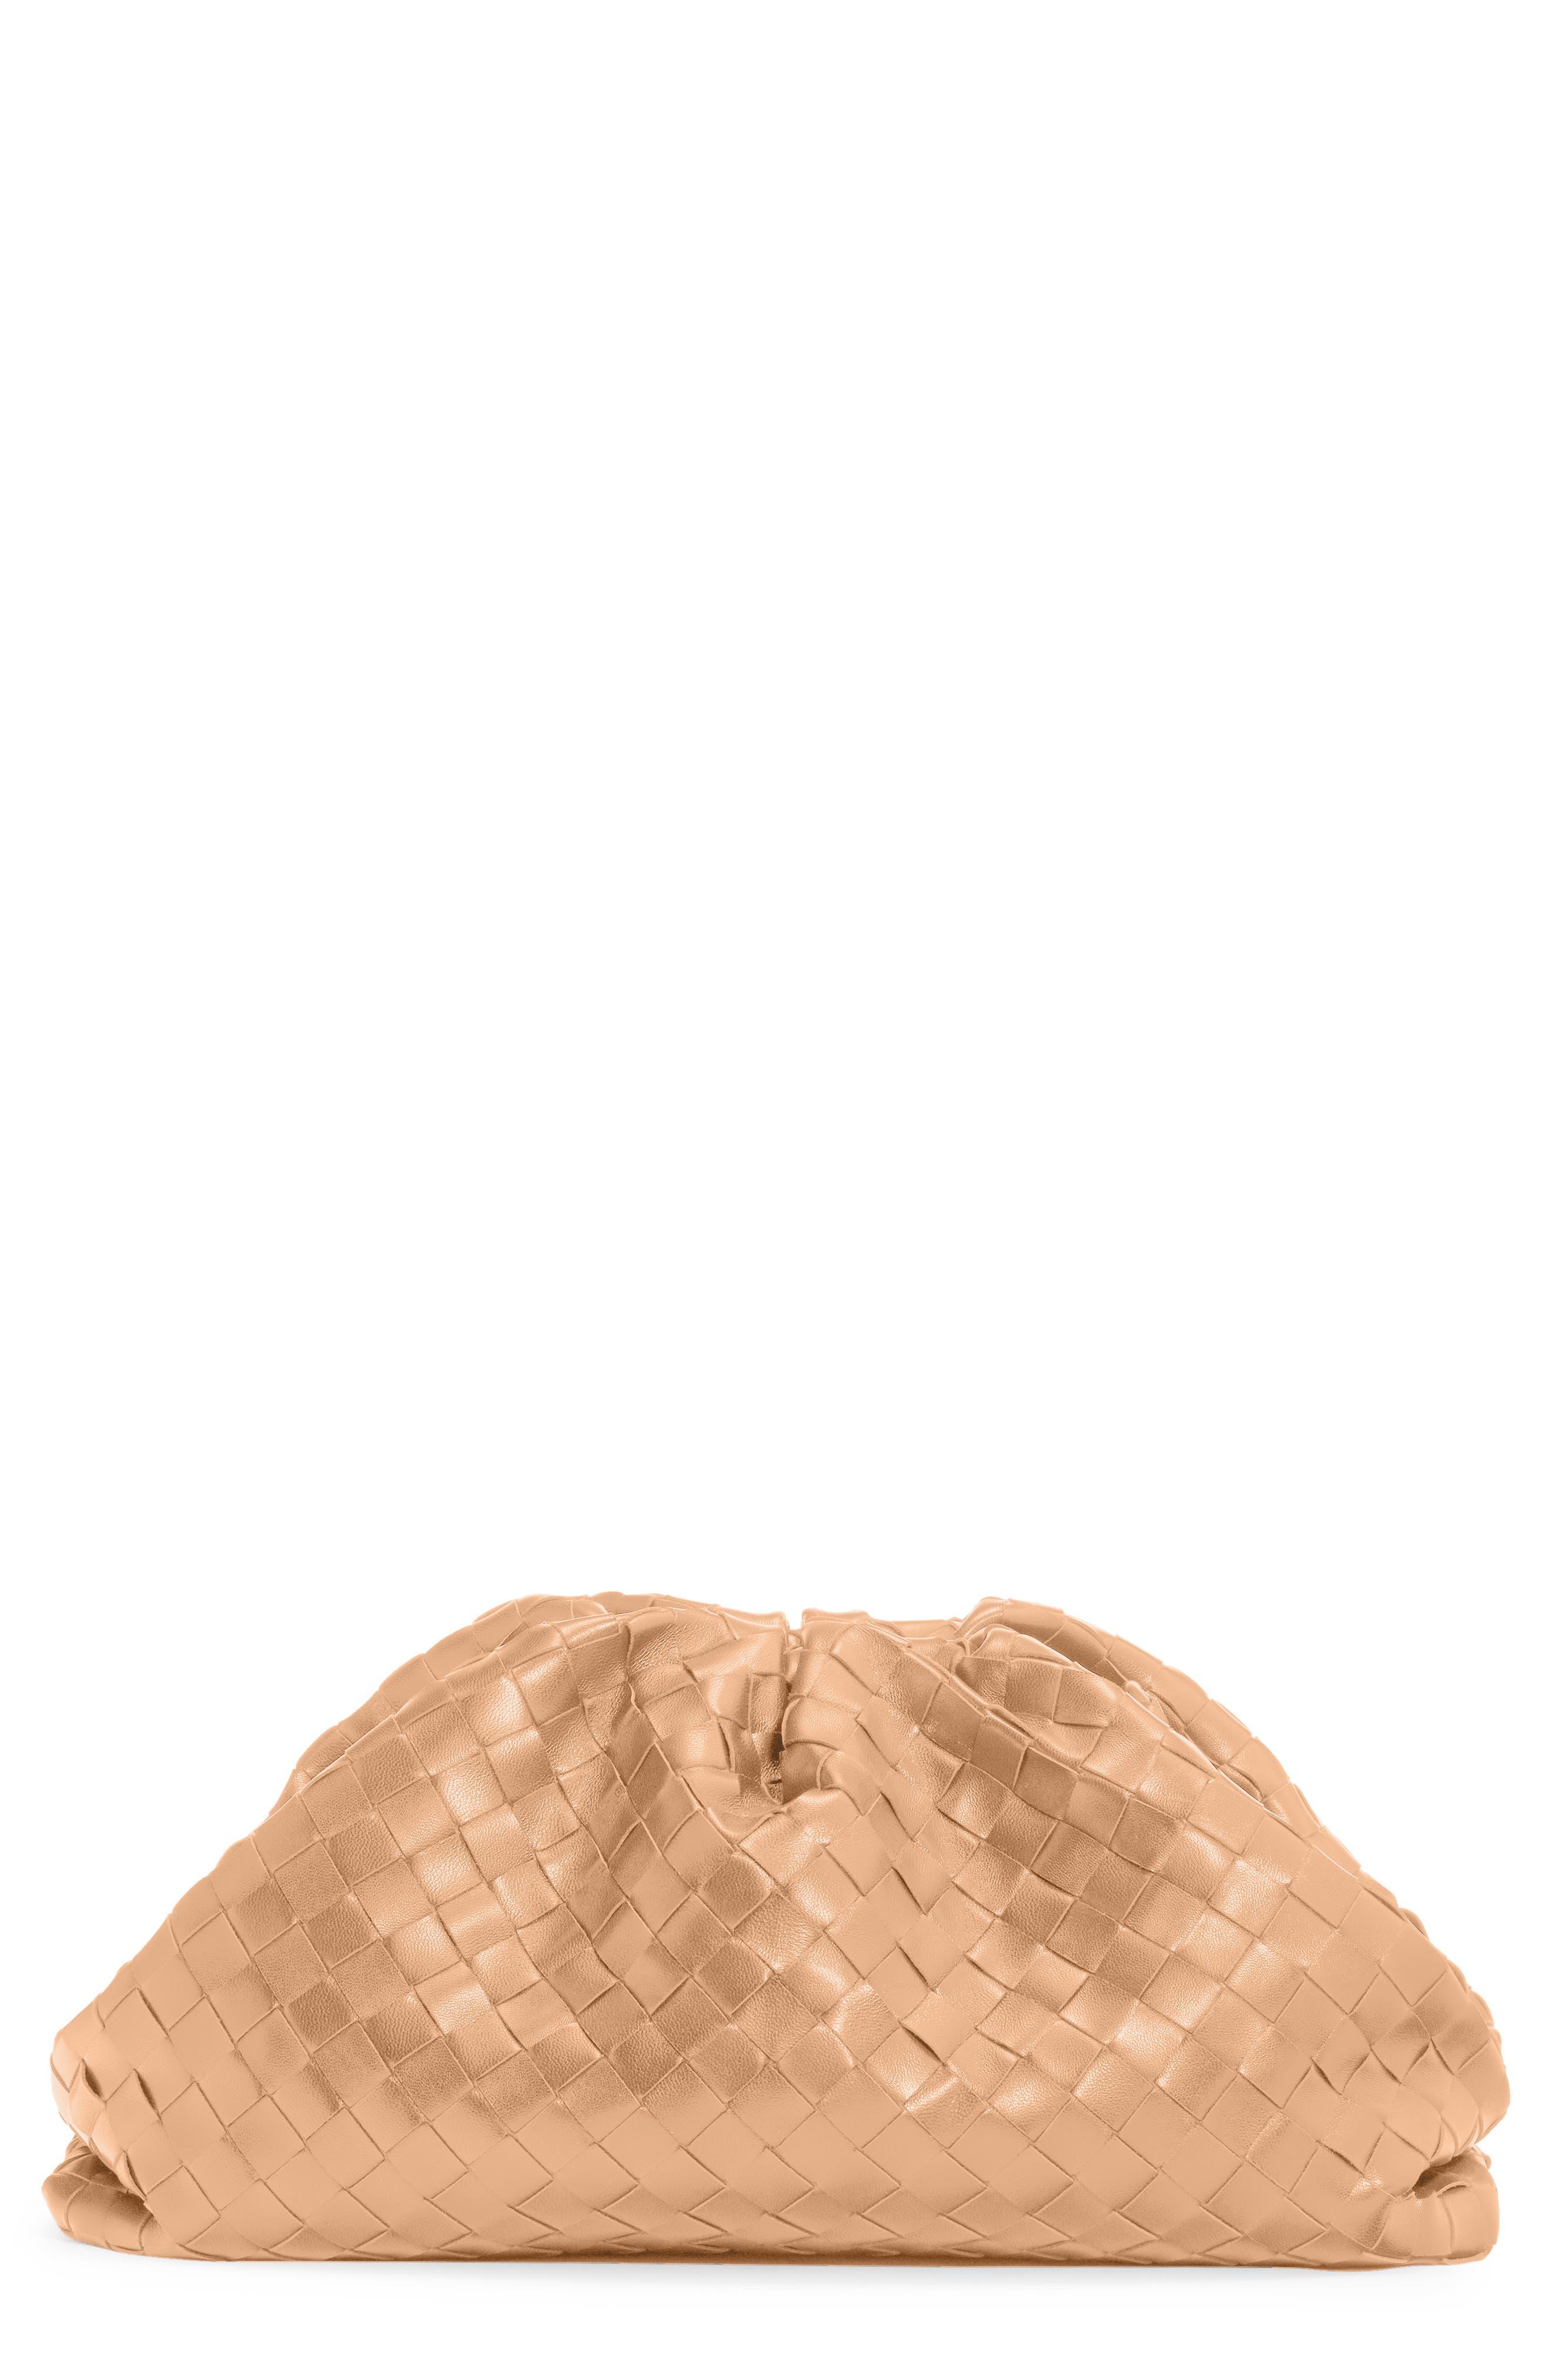 Bottega Veneta Intrecciato Leather Pouch | Nordstrom